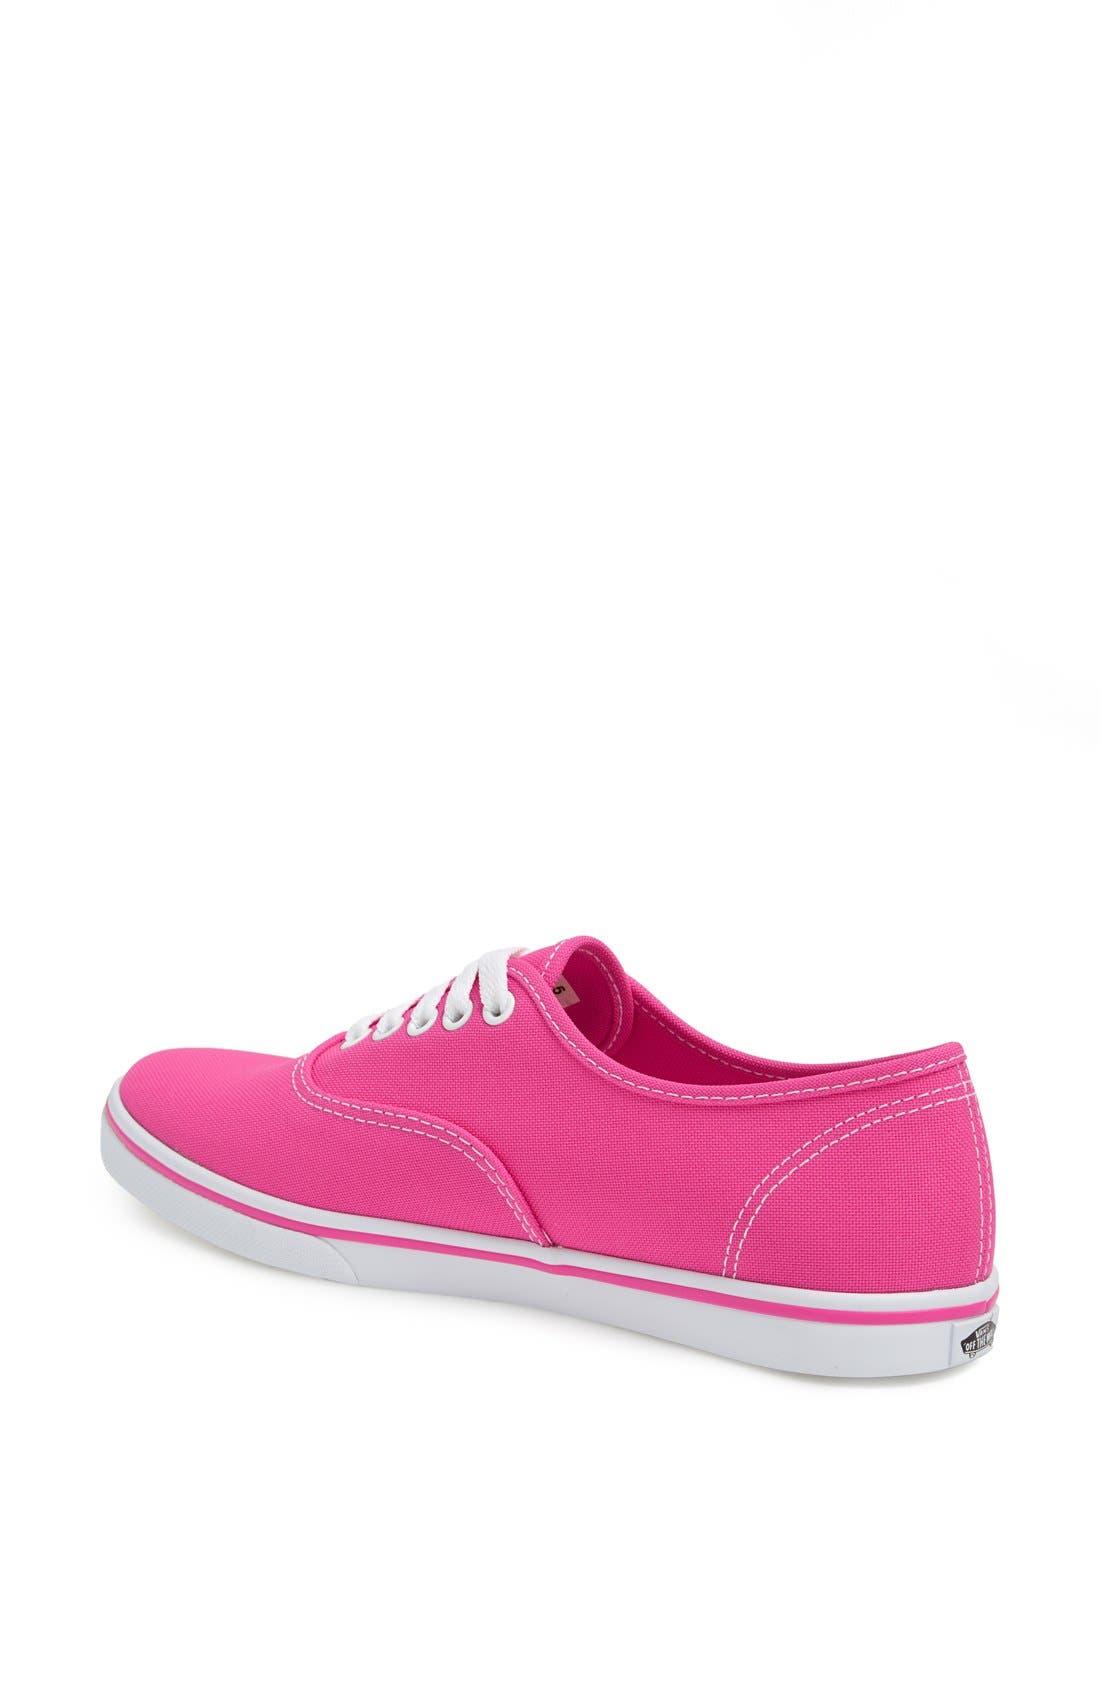 Alternate Image 2  - Vans 'Authentic - Lo Pro' Sneaker (Women)